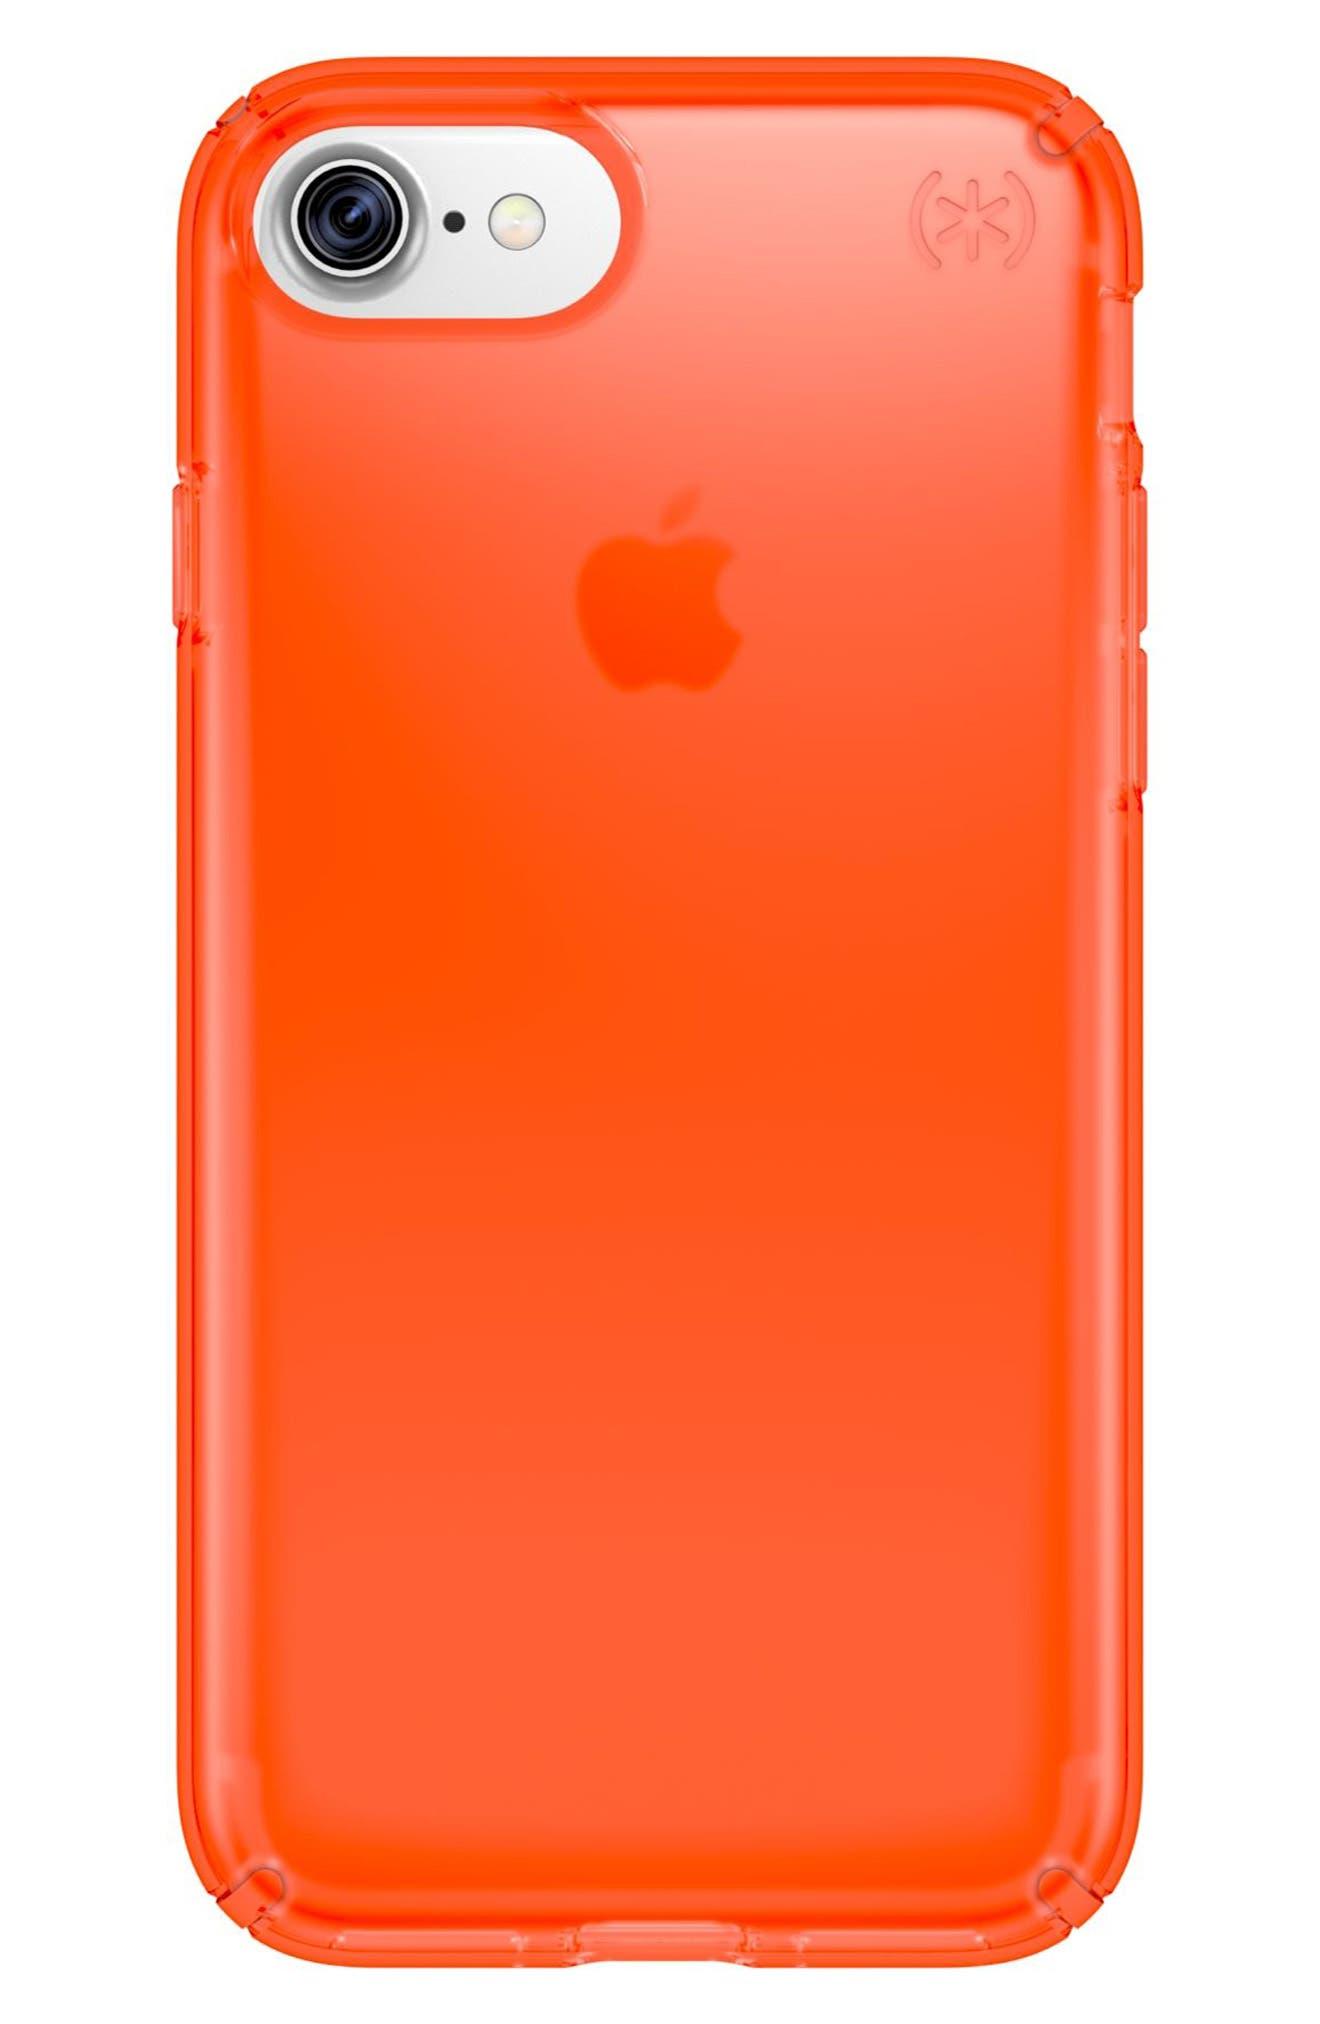 Speck Presidio Clear iPhone 6/6s/7/8 Plus Case